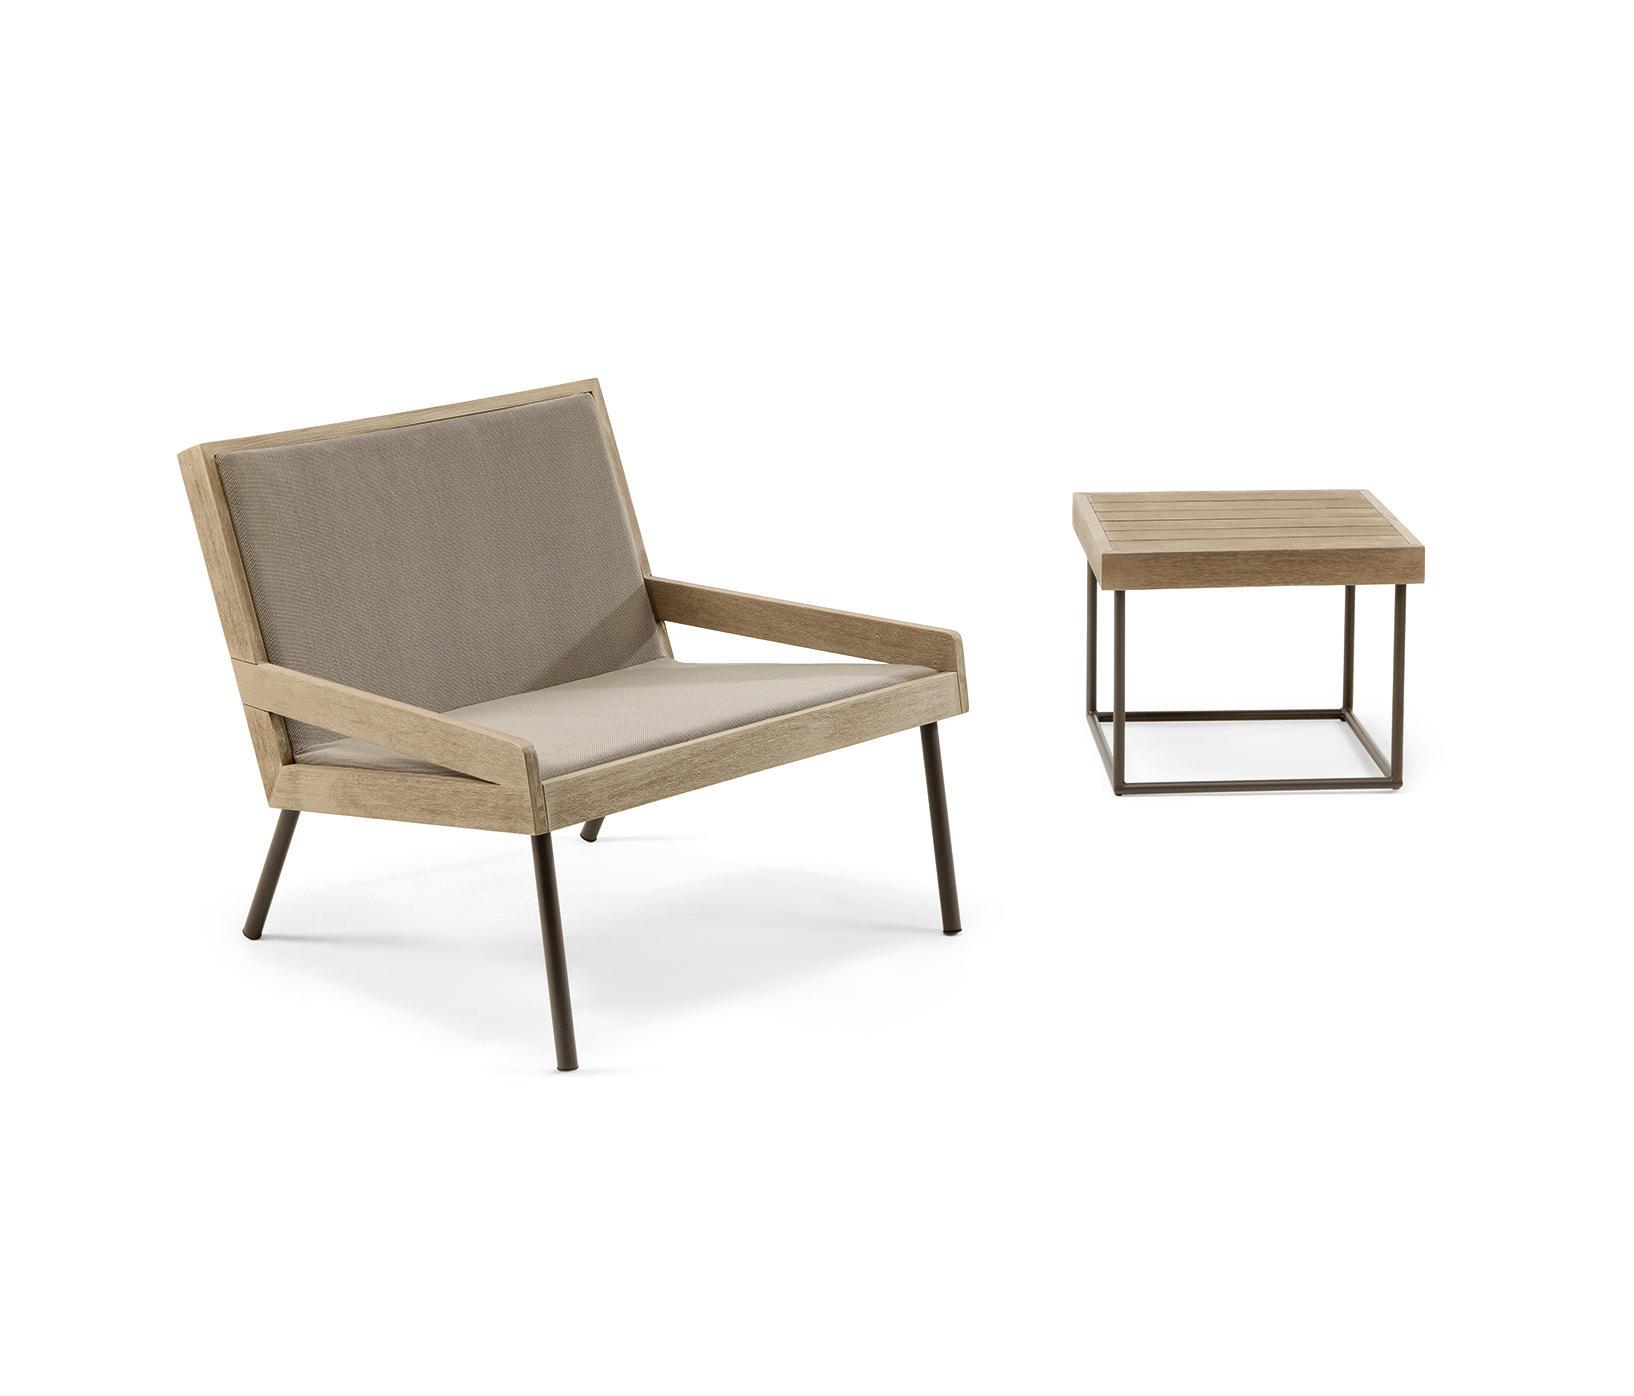 Etonnant ... Allaperto Urban Lounge Armchair By Ethimo